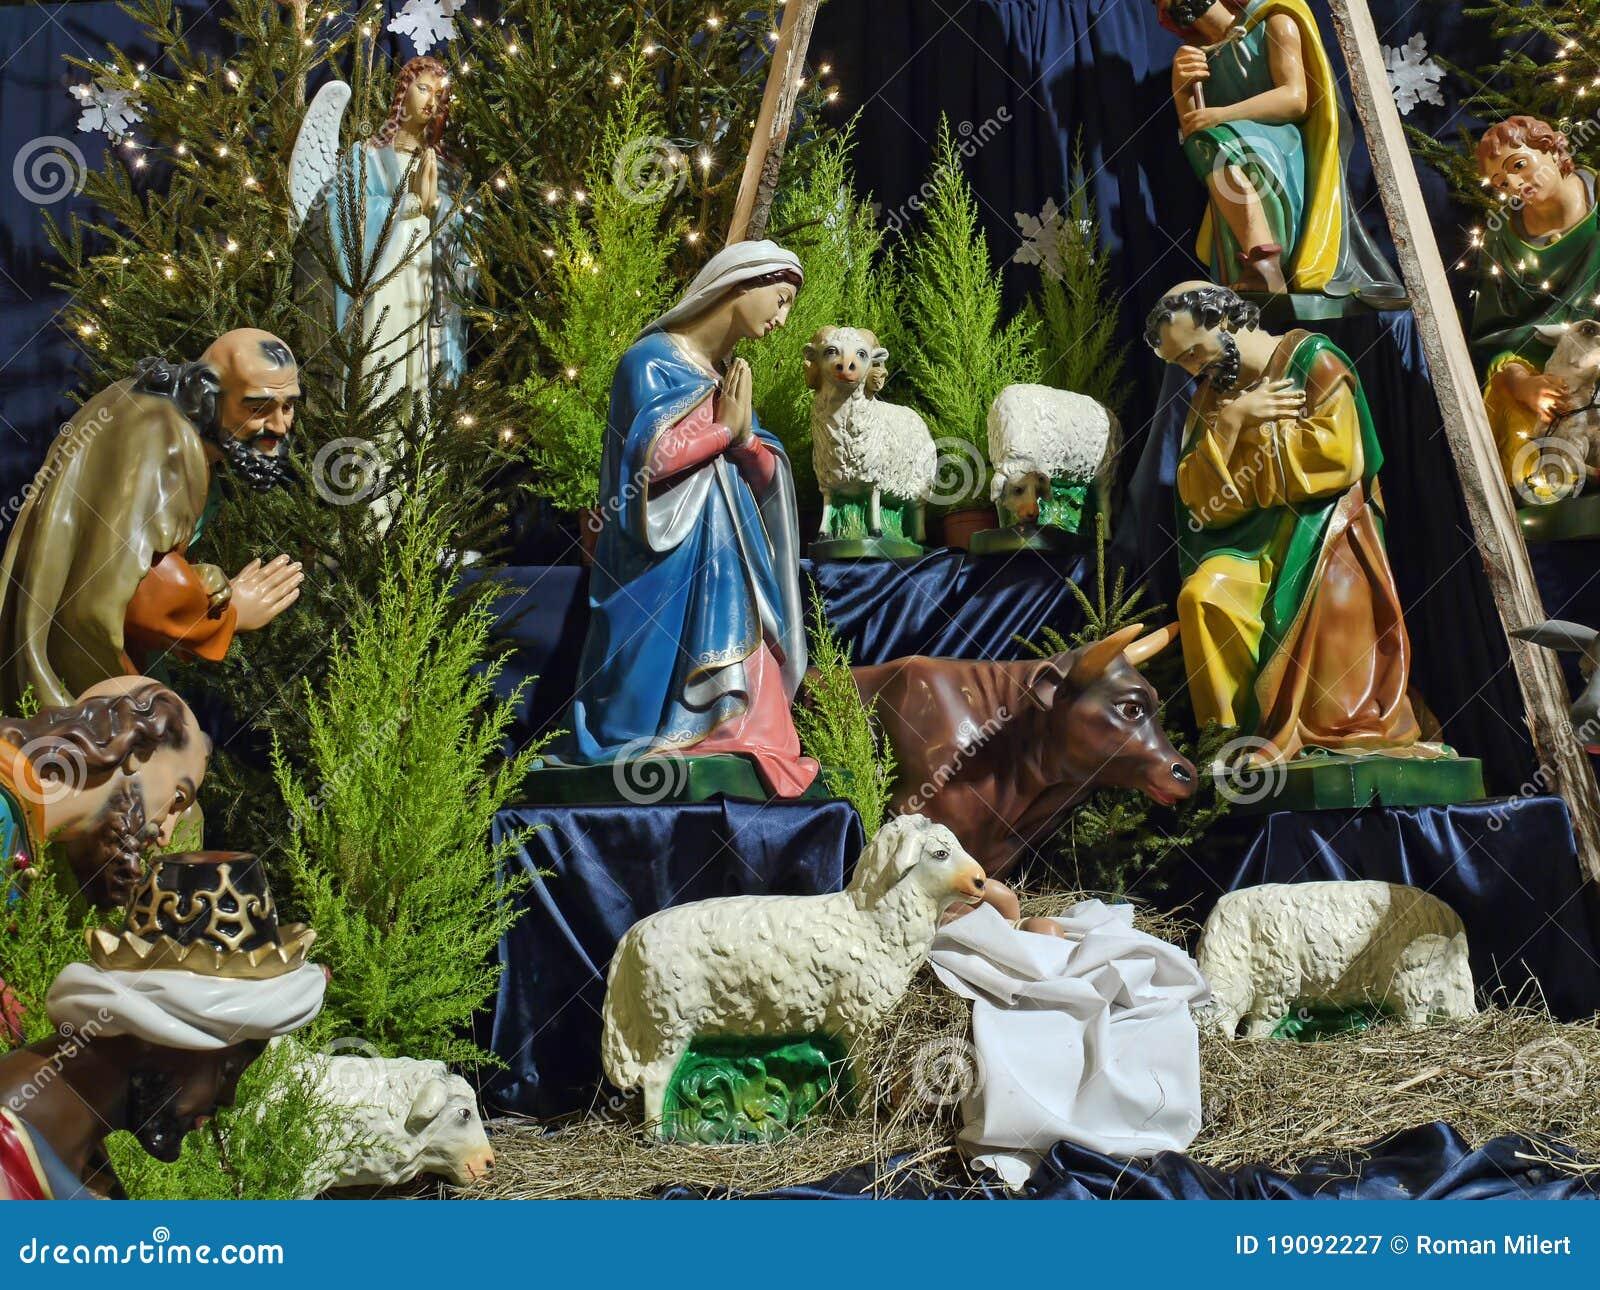 Christmas Crib Figures Representing Holy Family Three Wisemen Shepherds And Animals Royalty Free